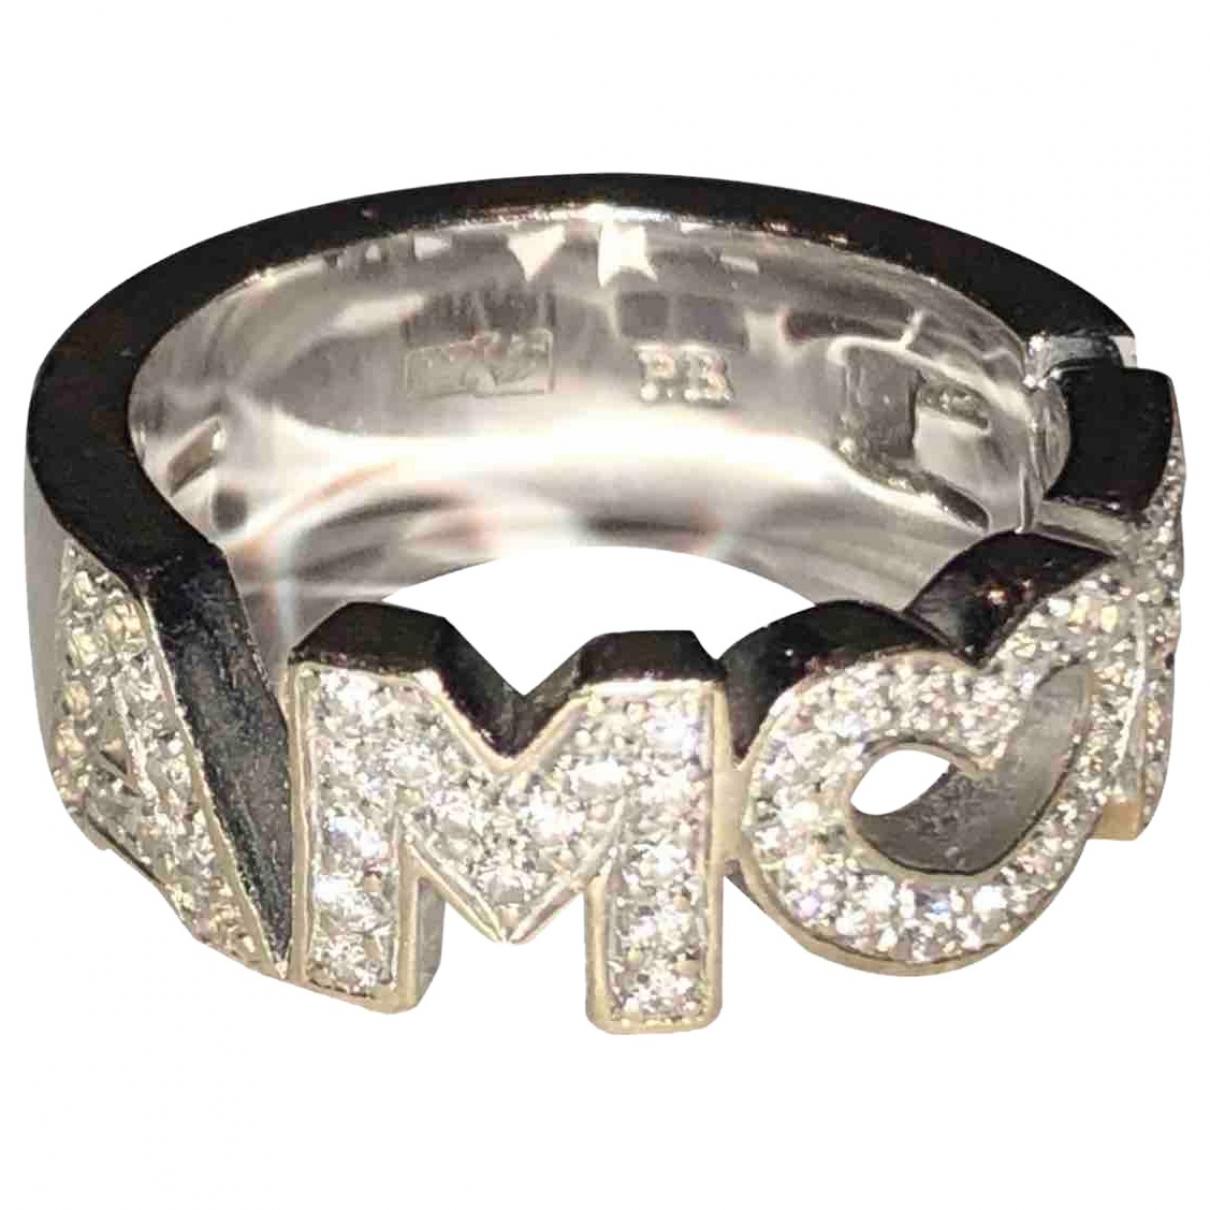 Pasquale Bruni \N Metallic White gold ring for Women \N